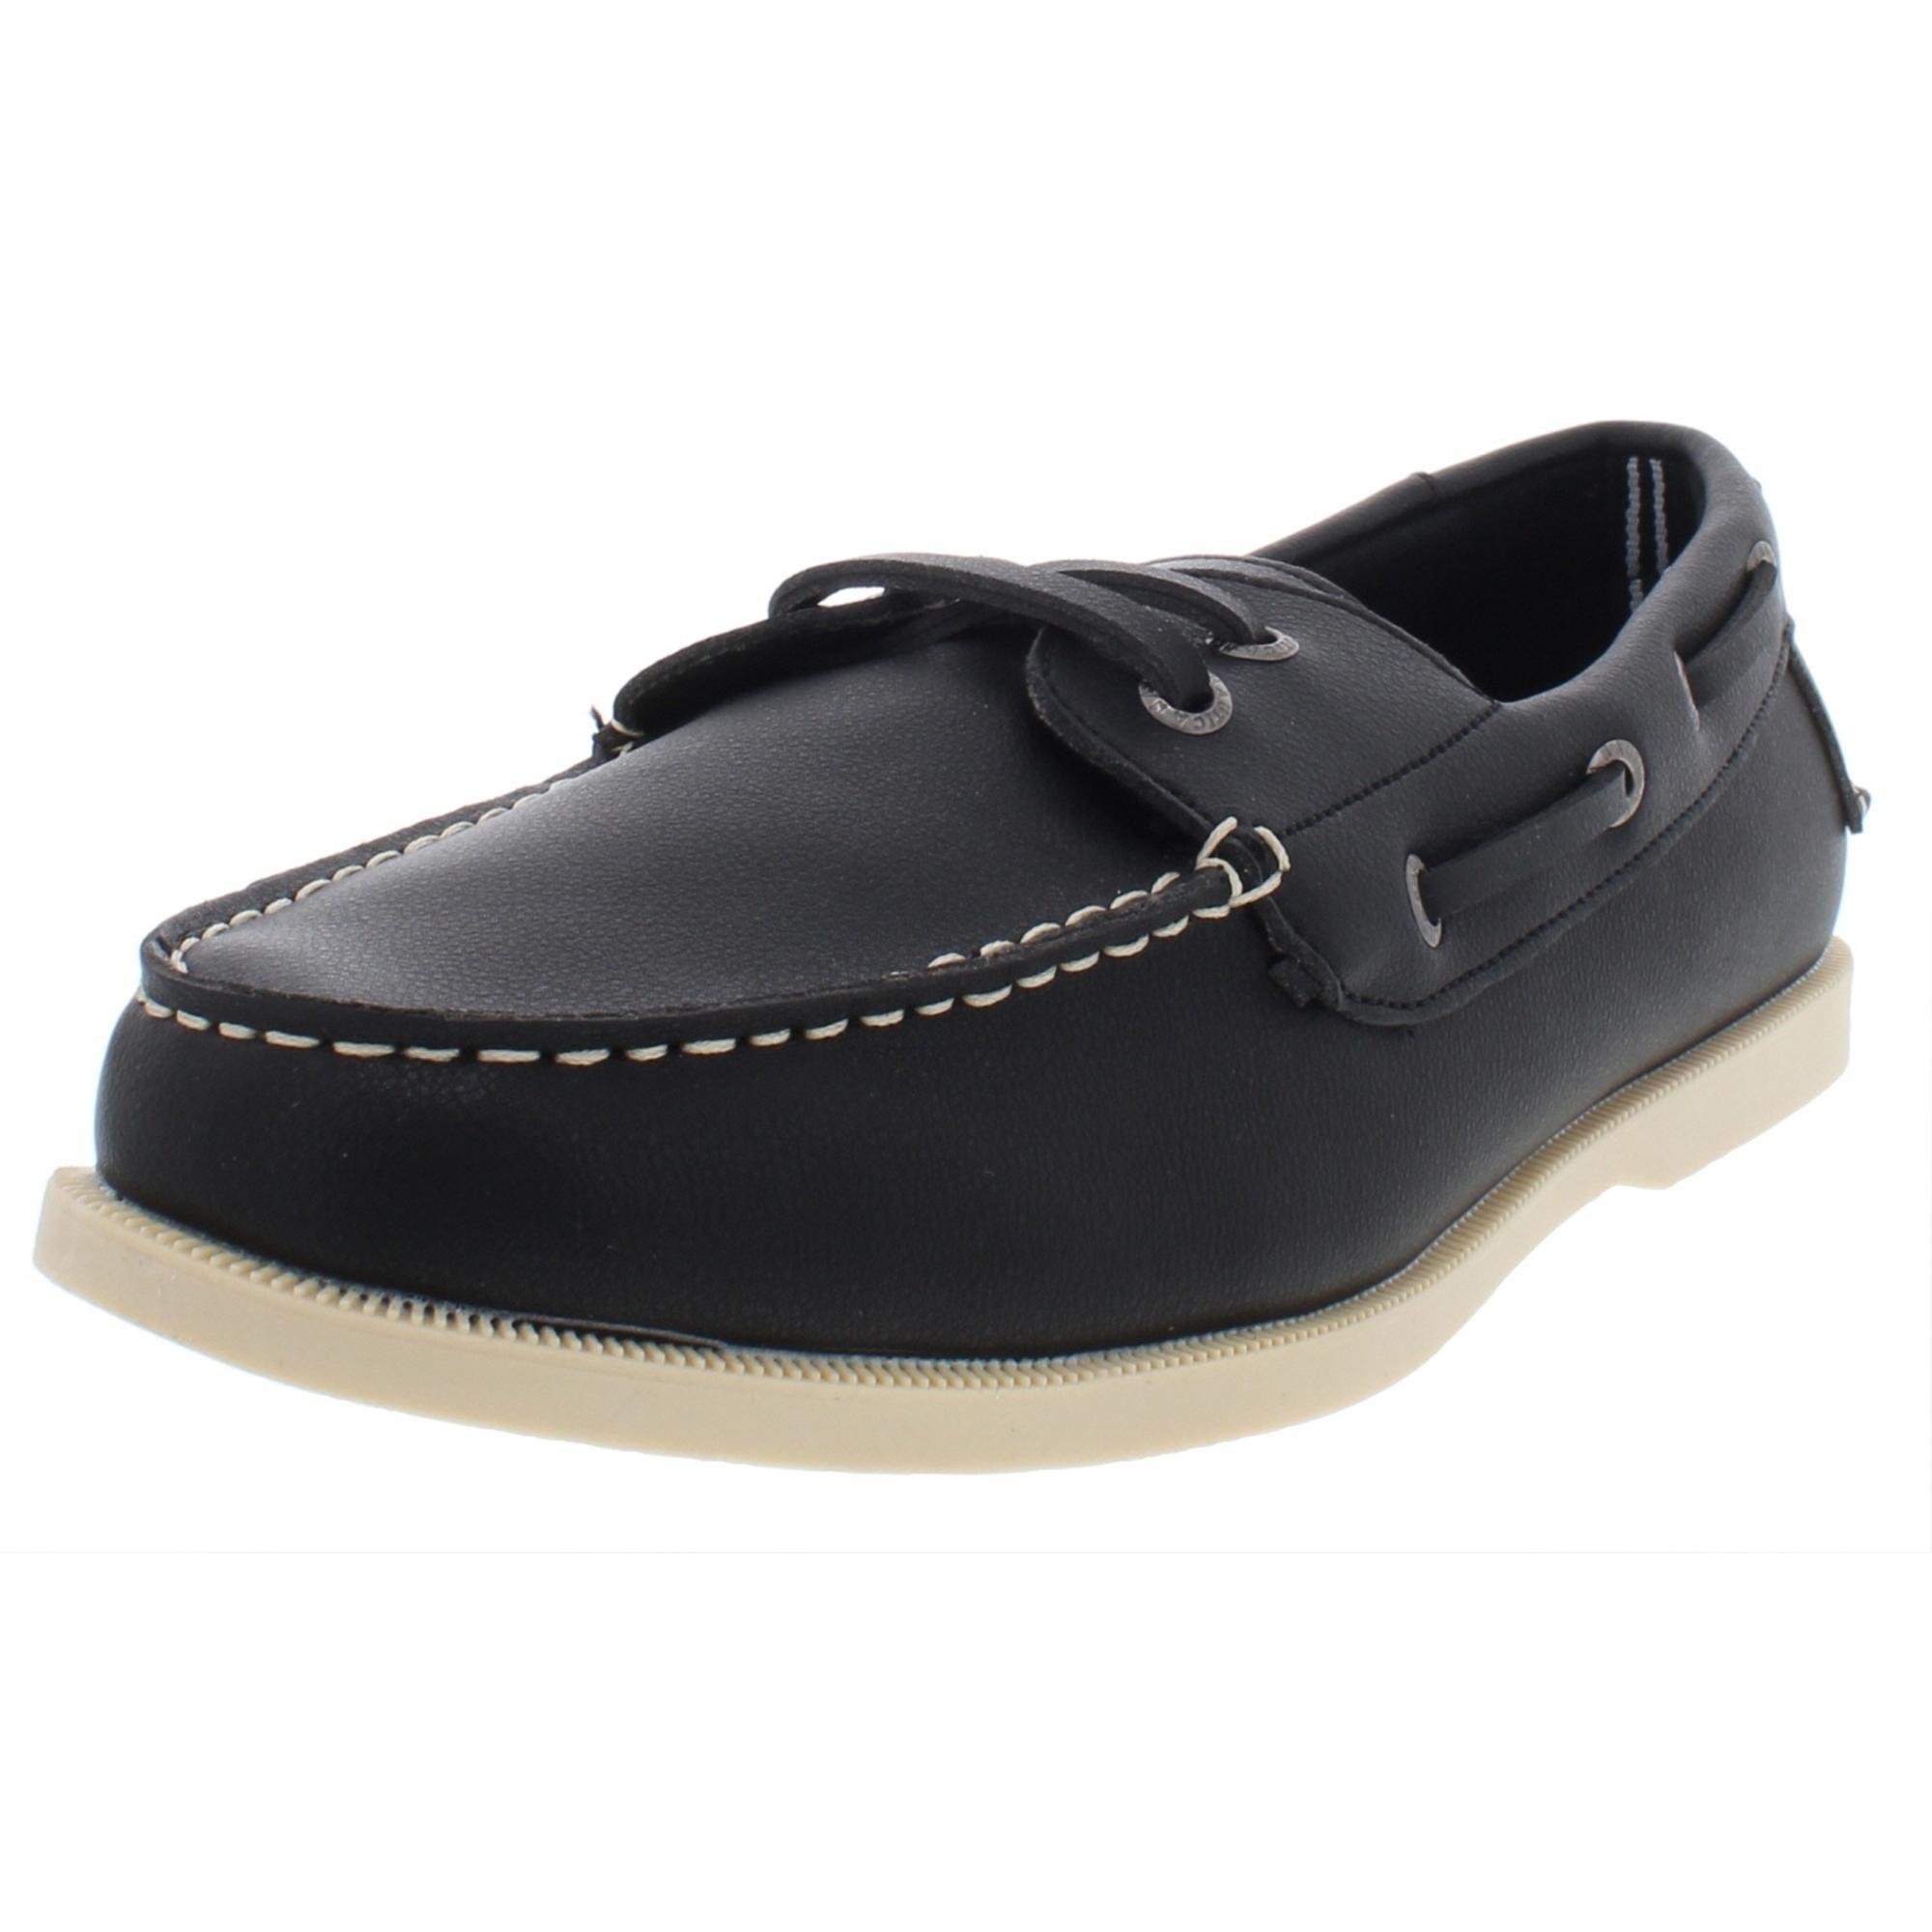 Nautica Mens Nueltin Boat Shoes Faux